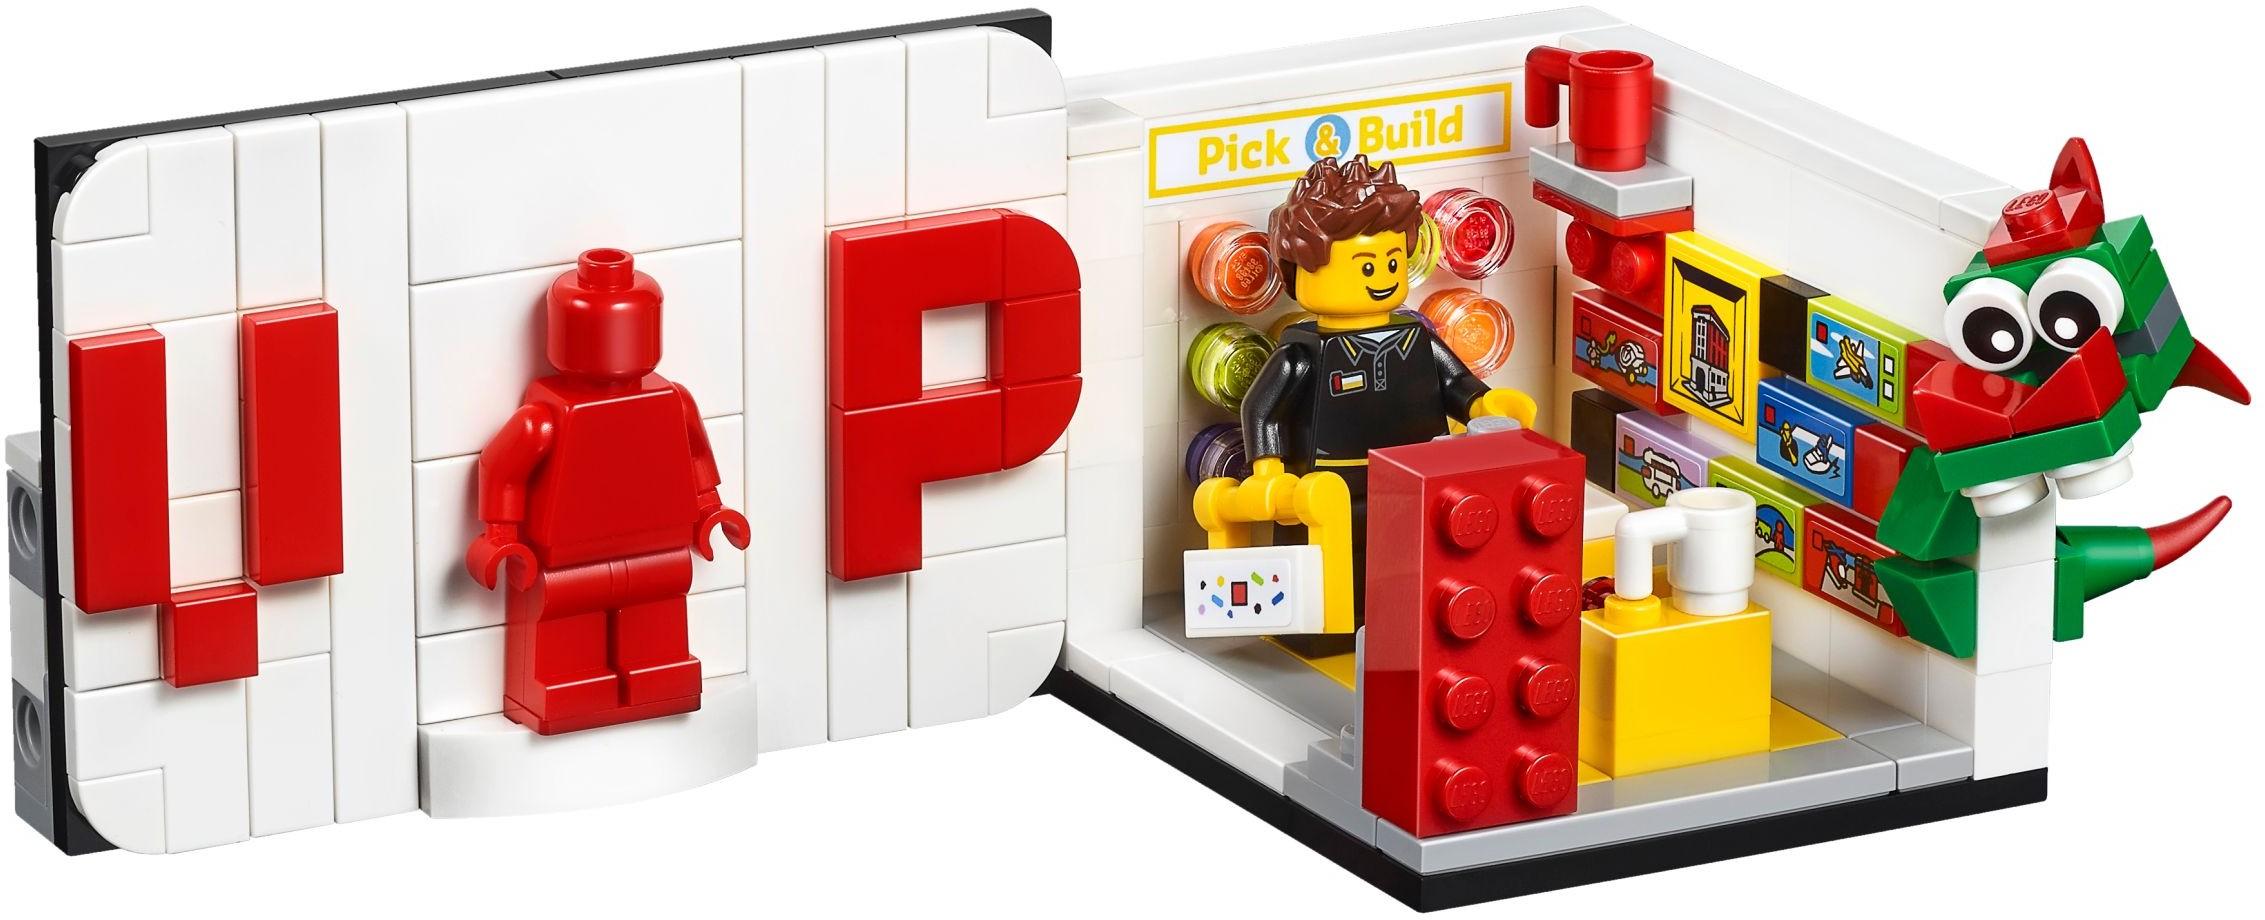 LEGO 6313092 Surfer Van Promo BRAND NEW